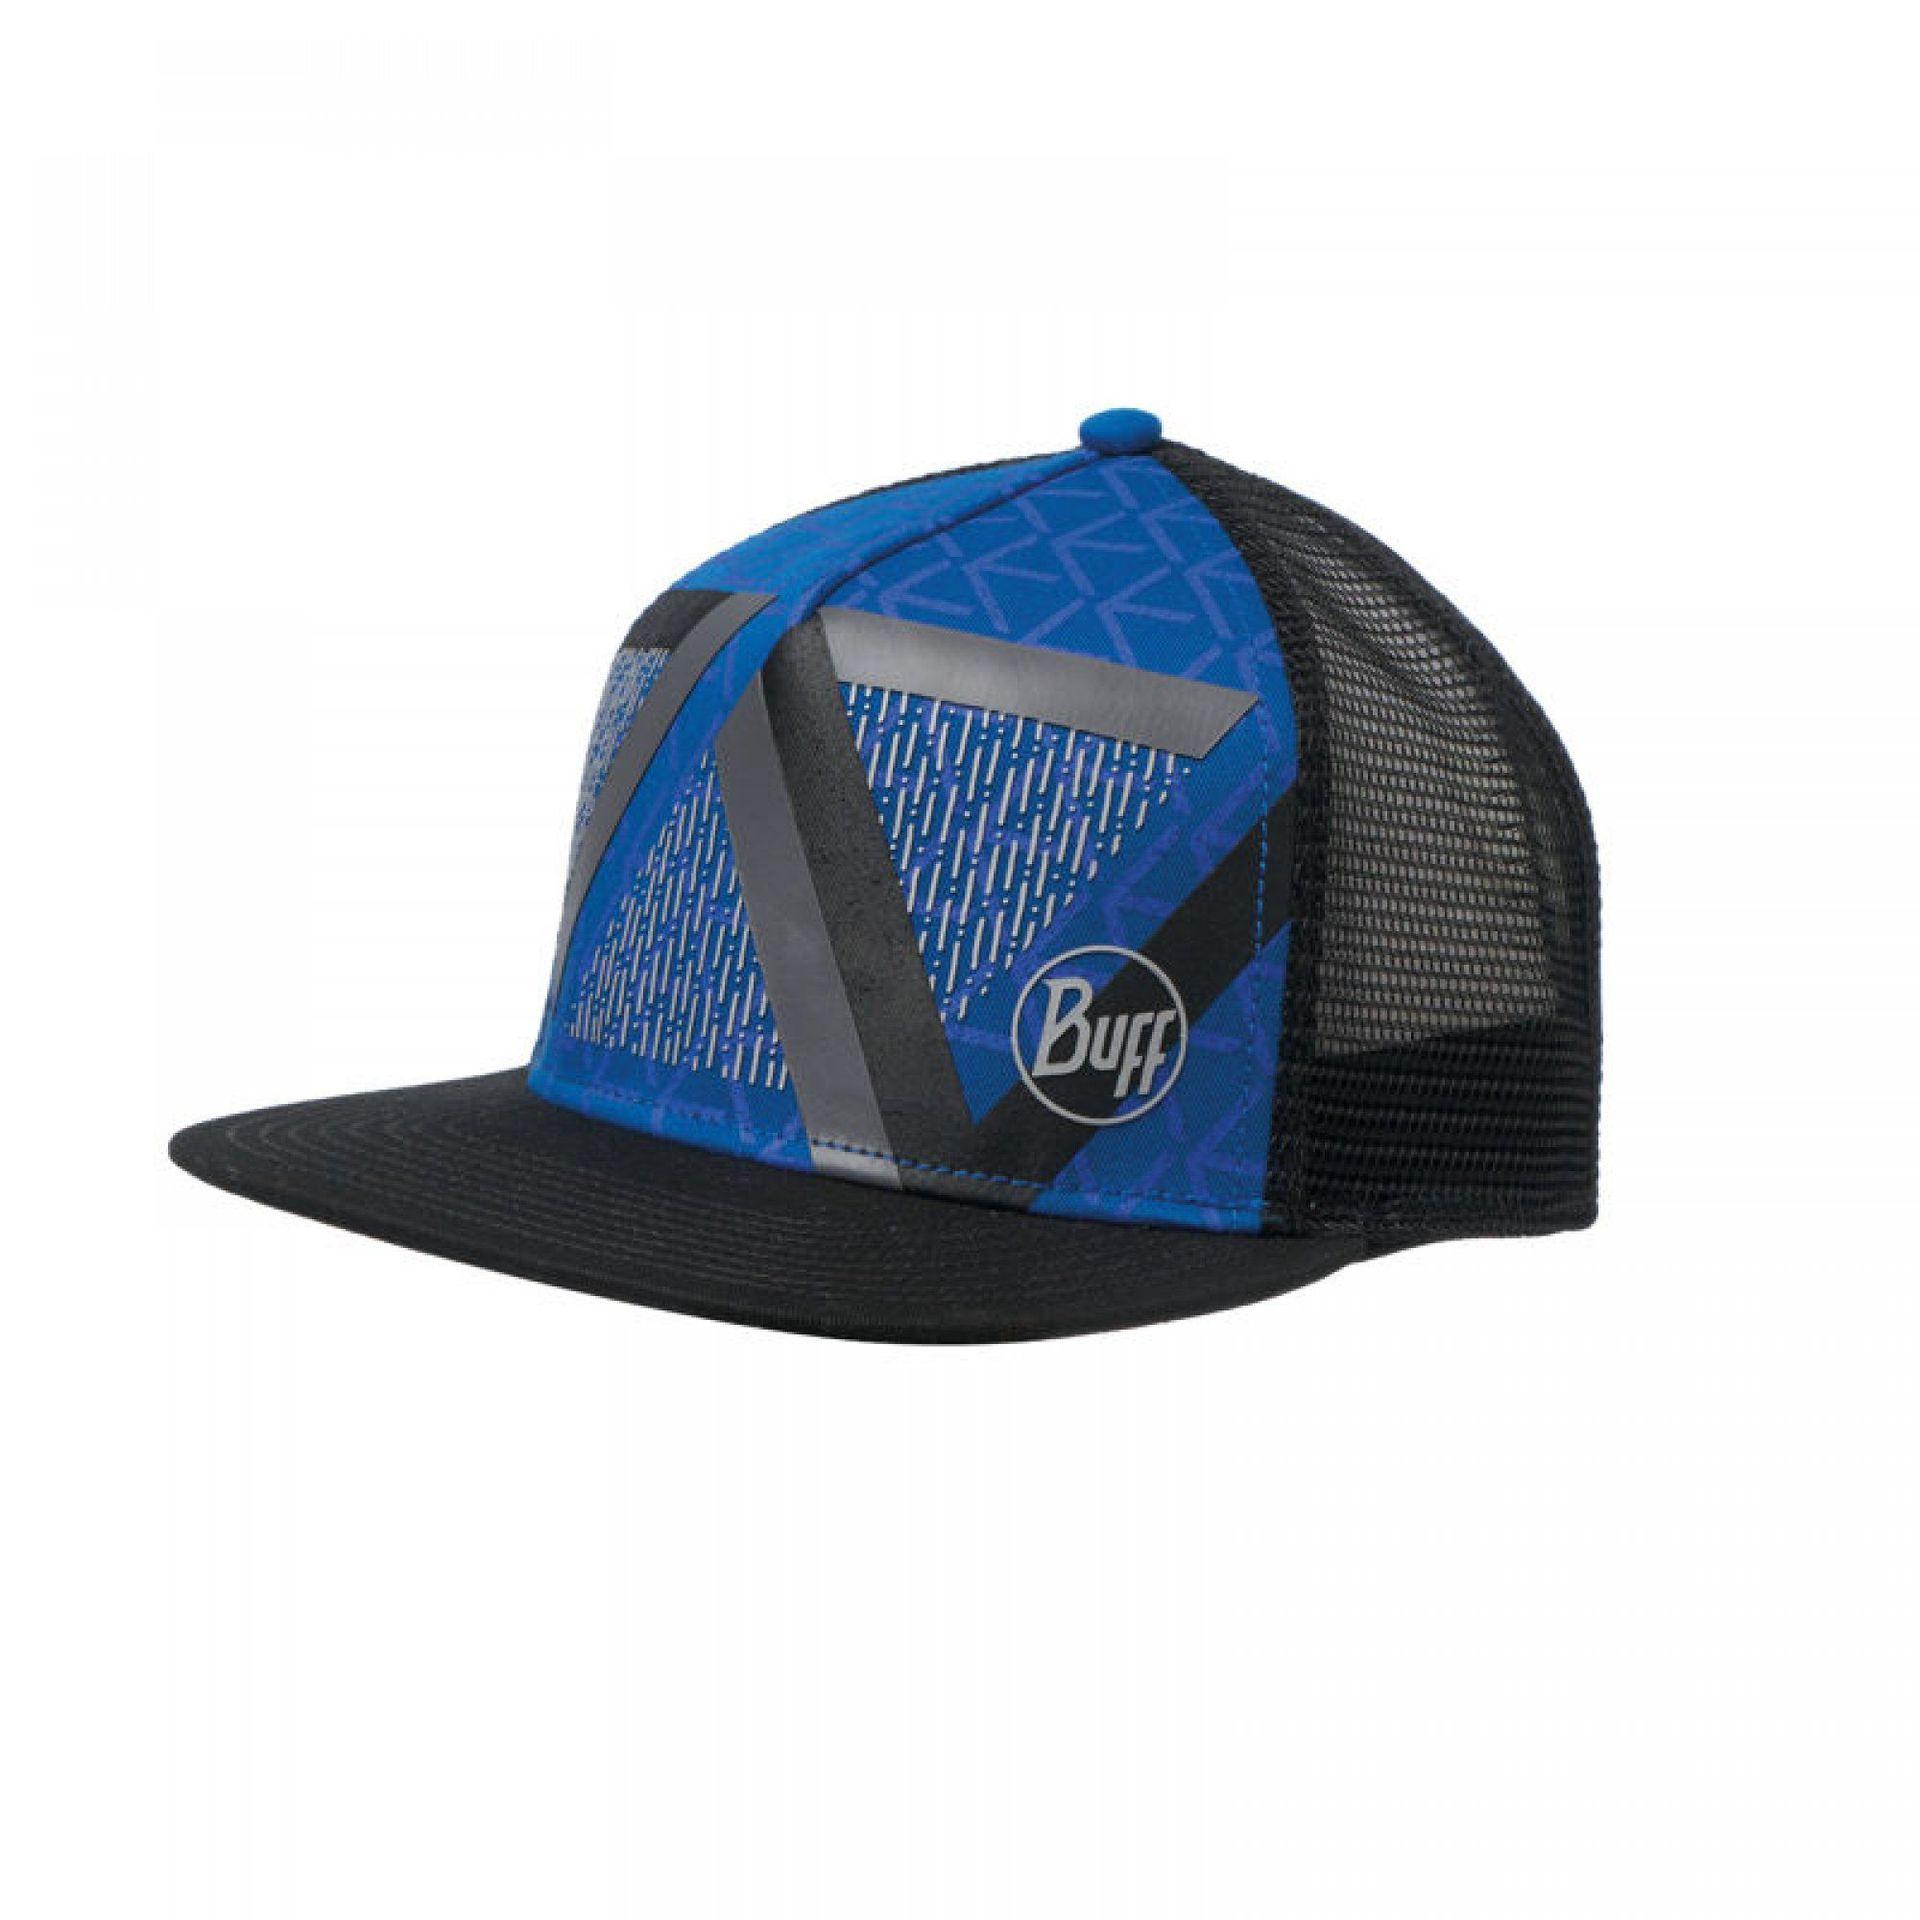 CZAPKA Z DASZKIEM BUFF TRUCKER OPTIC BLOCK CAPE BLUE